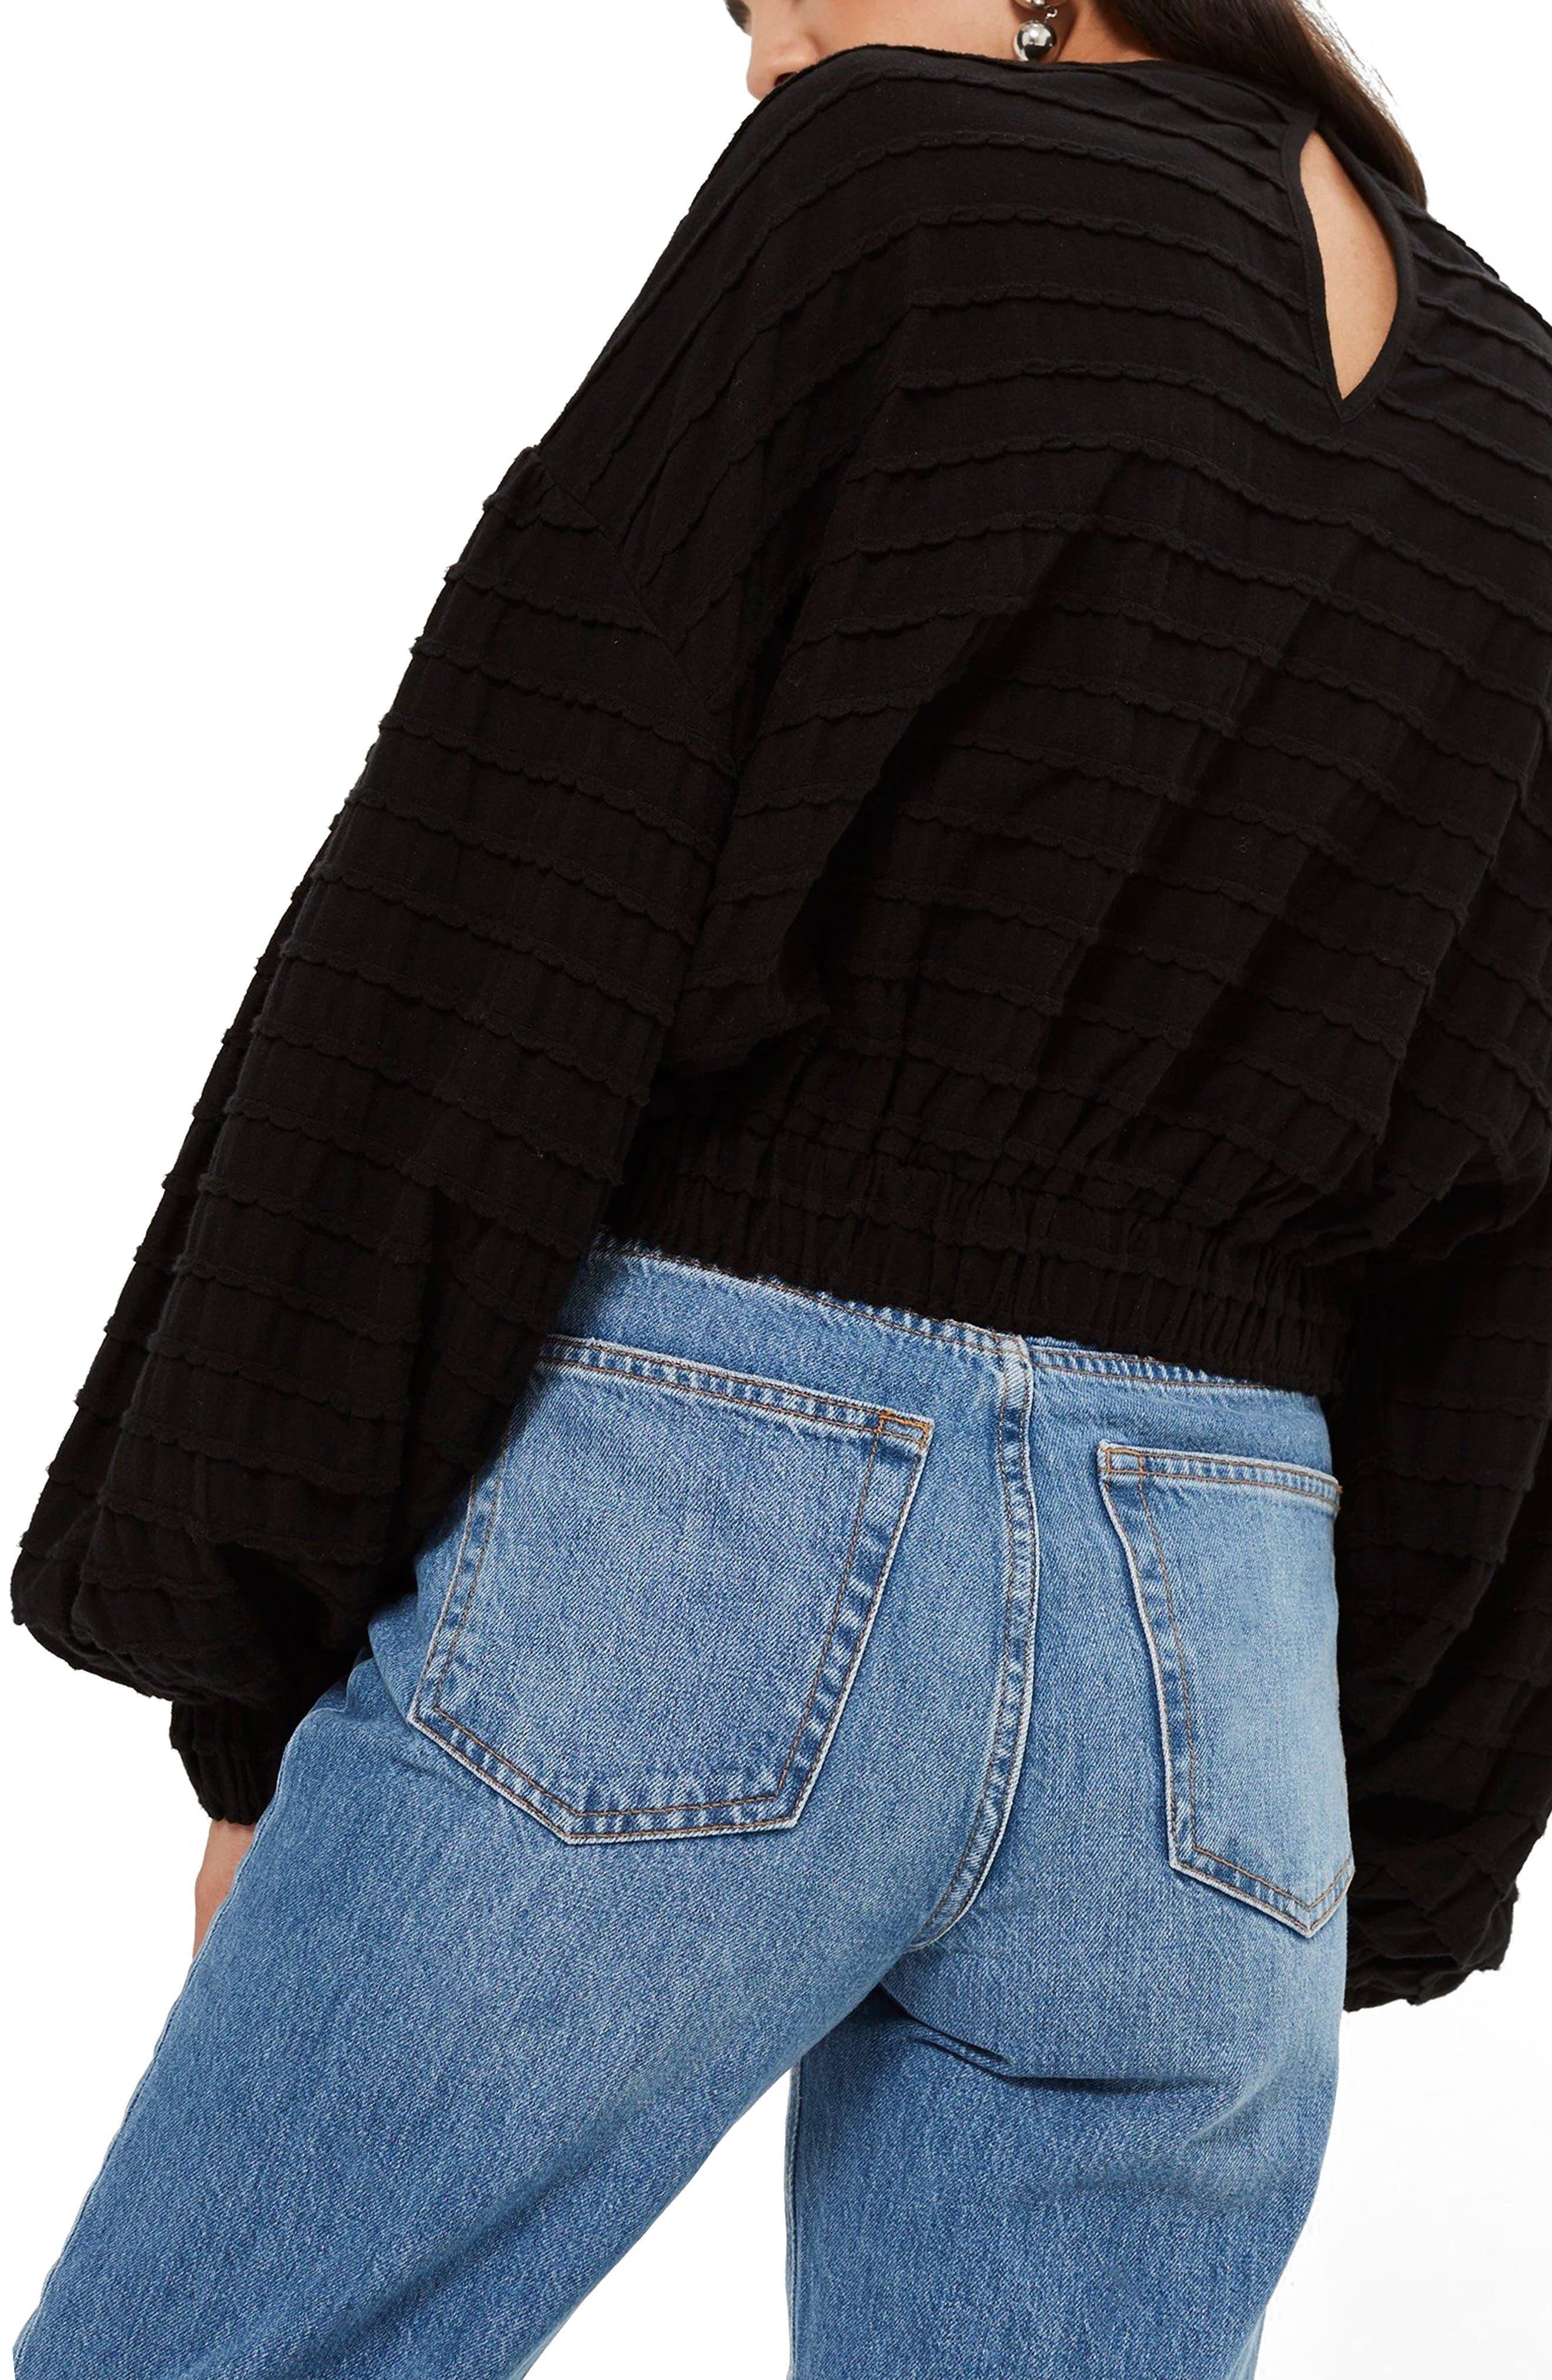 Crochet Inset Top,                             Alternate thumbnail 2, color,                             Black